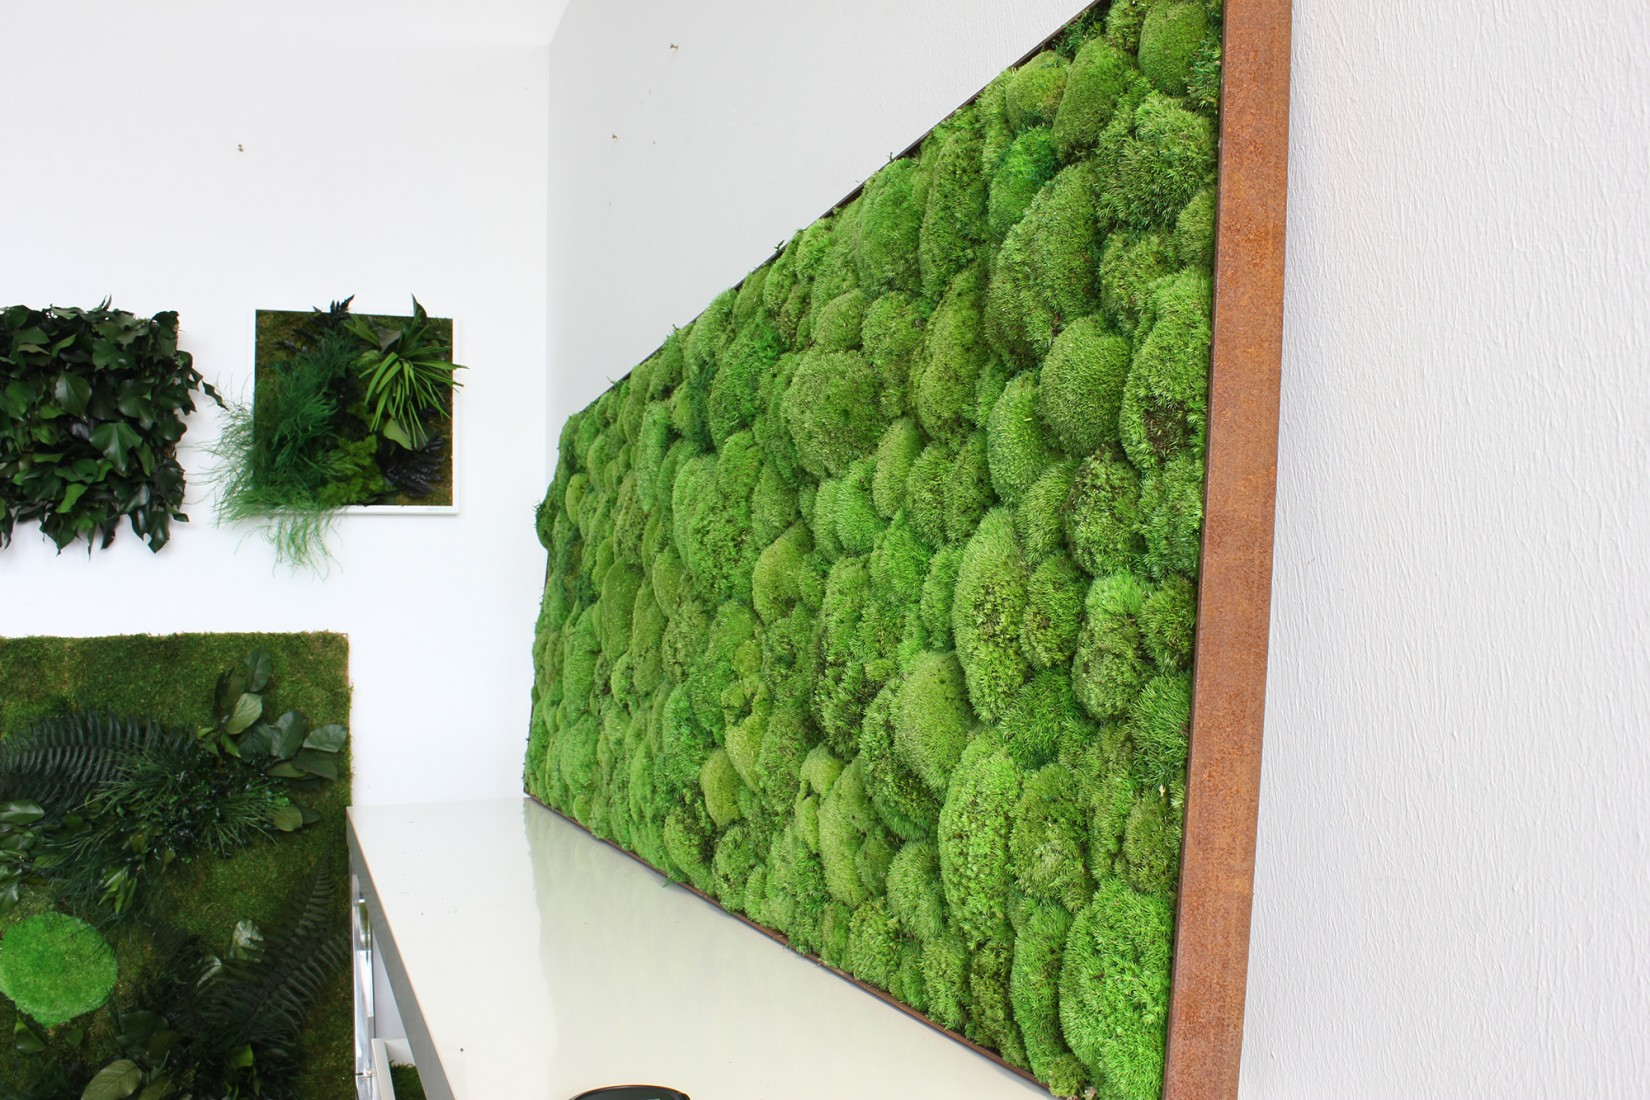 wandbegr nung indoor fassade pflanzen beet. Black Bedroom Furniture Sets. Home Design Ideas